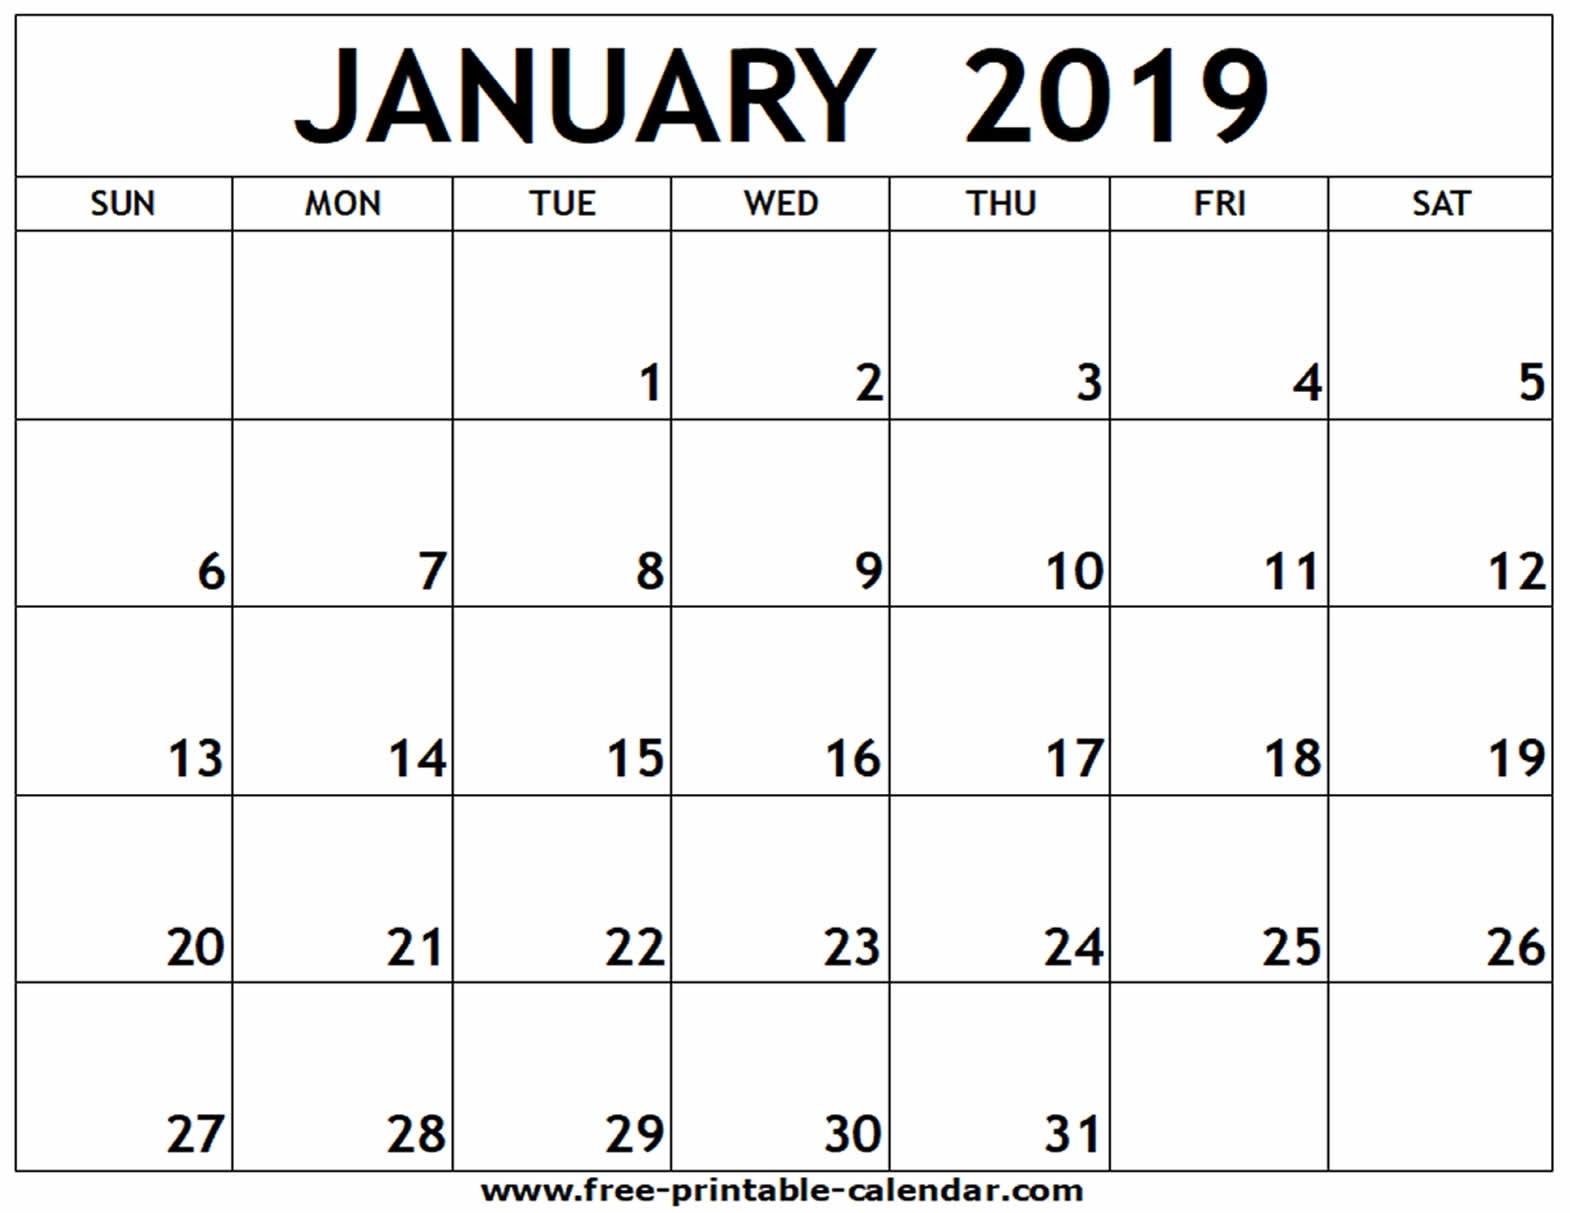 January 2019 Printable Calendar - Free-Printable-Calendar